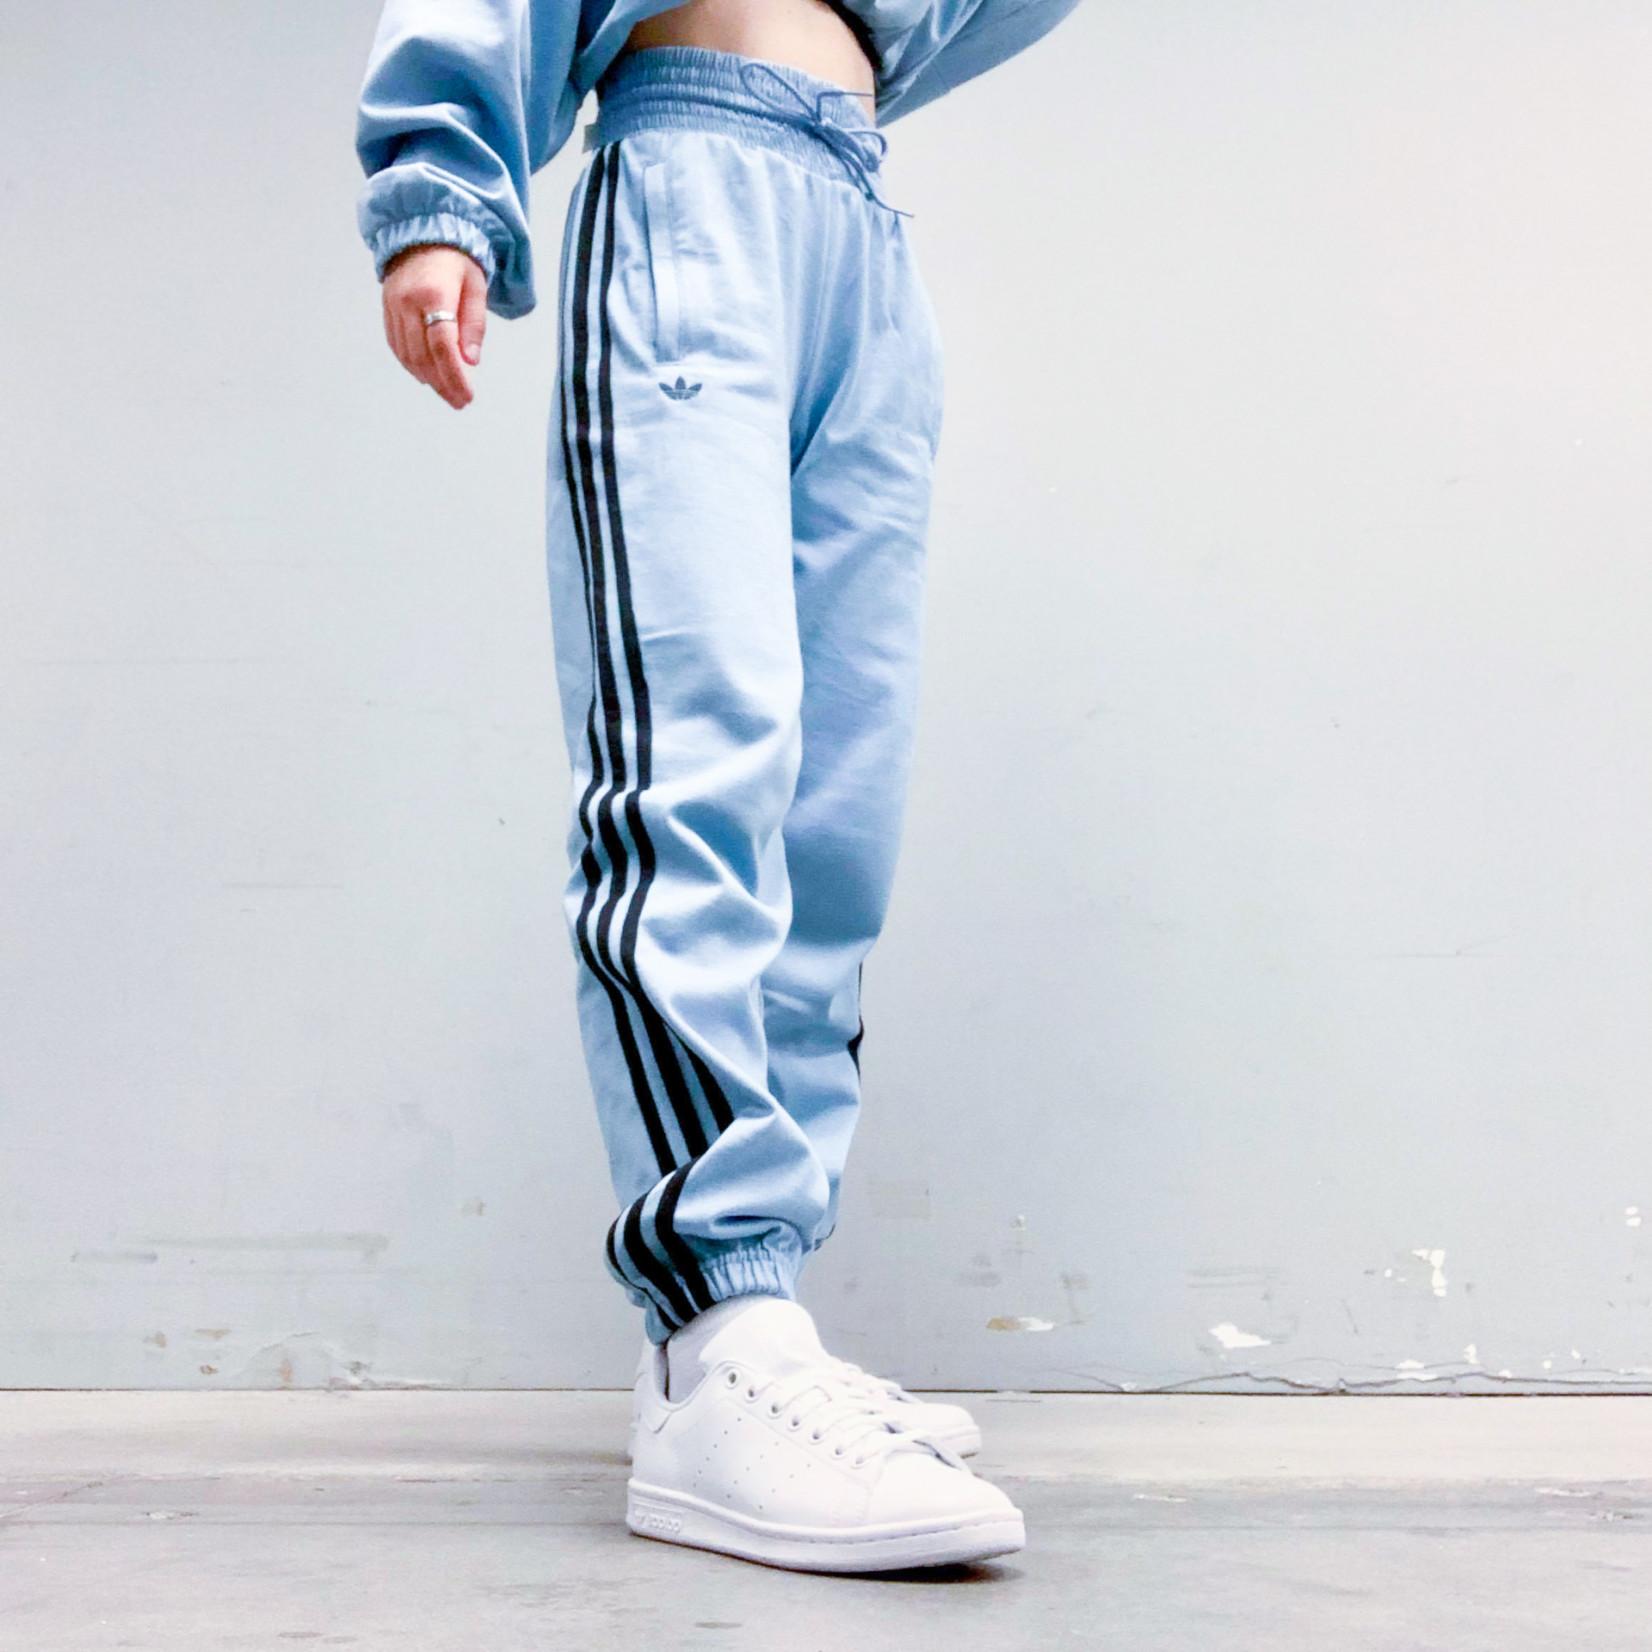 Adidas Adidas : Smoked Waist Cuffed Pant